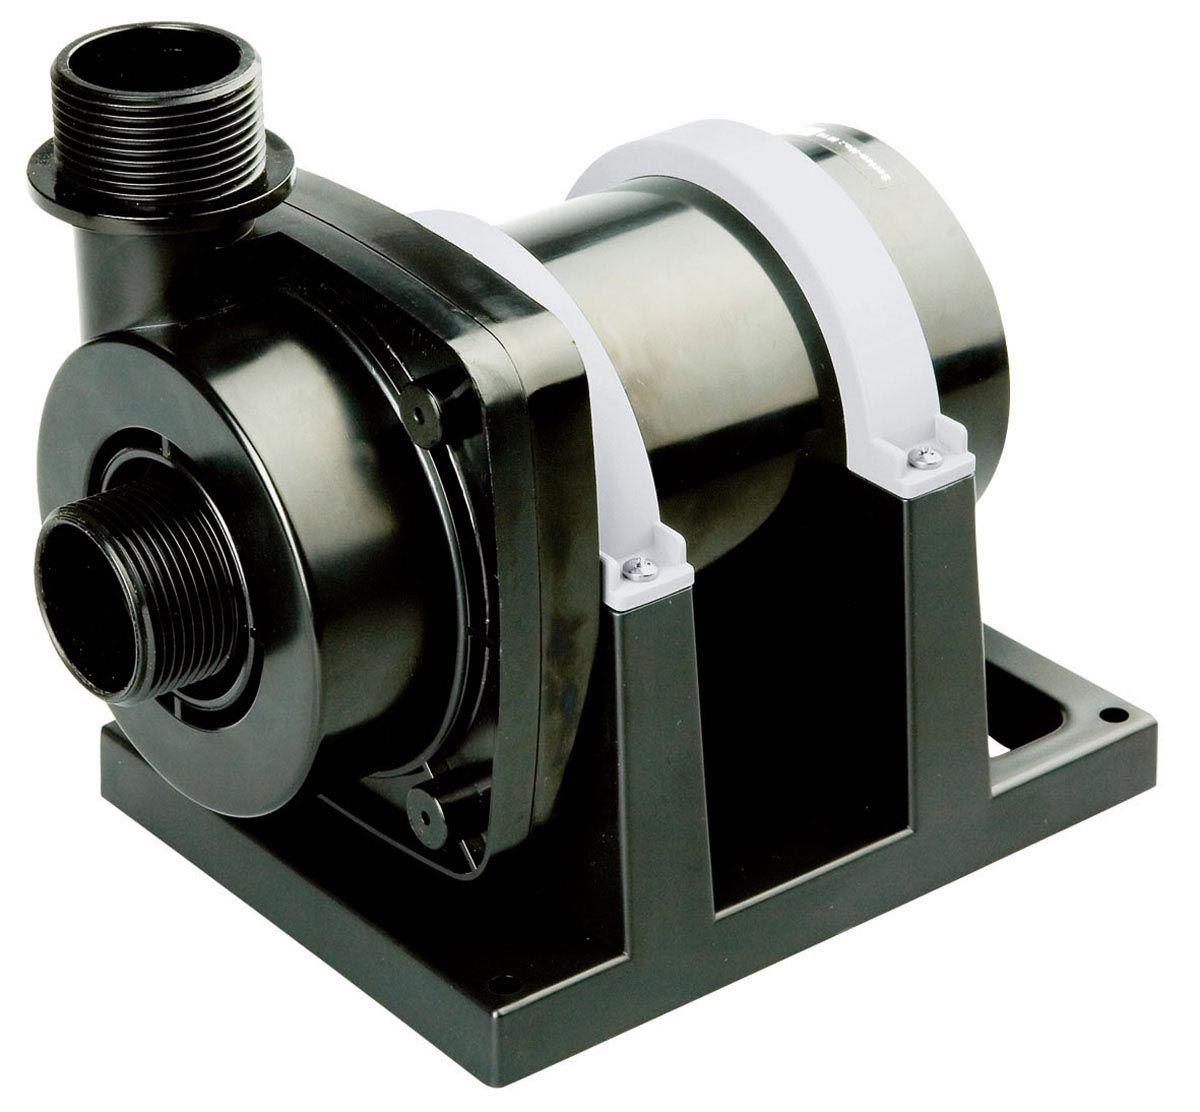 Teichpumpe Eco-Tec2 4500, H max. 3.1 m, Q max. 4900 l/h, 48 Watt, 230 x 145 x 192 mm